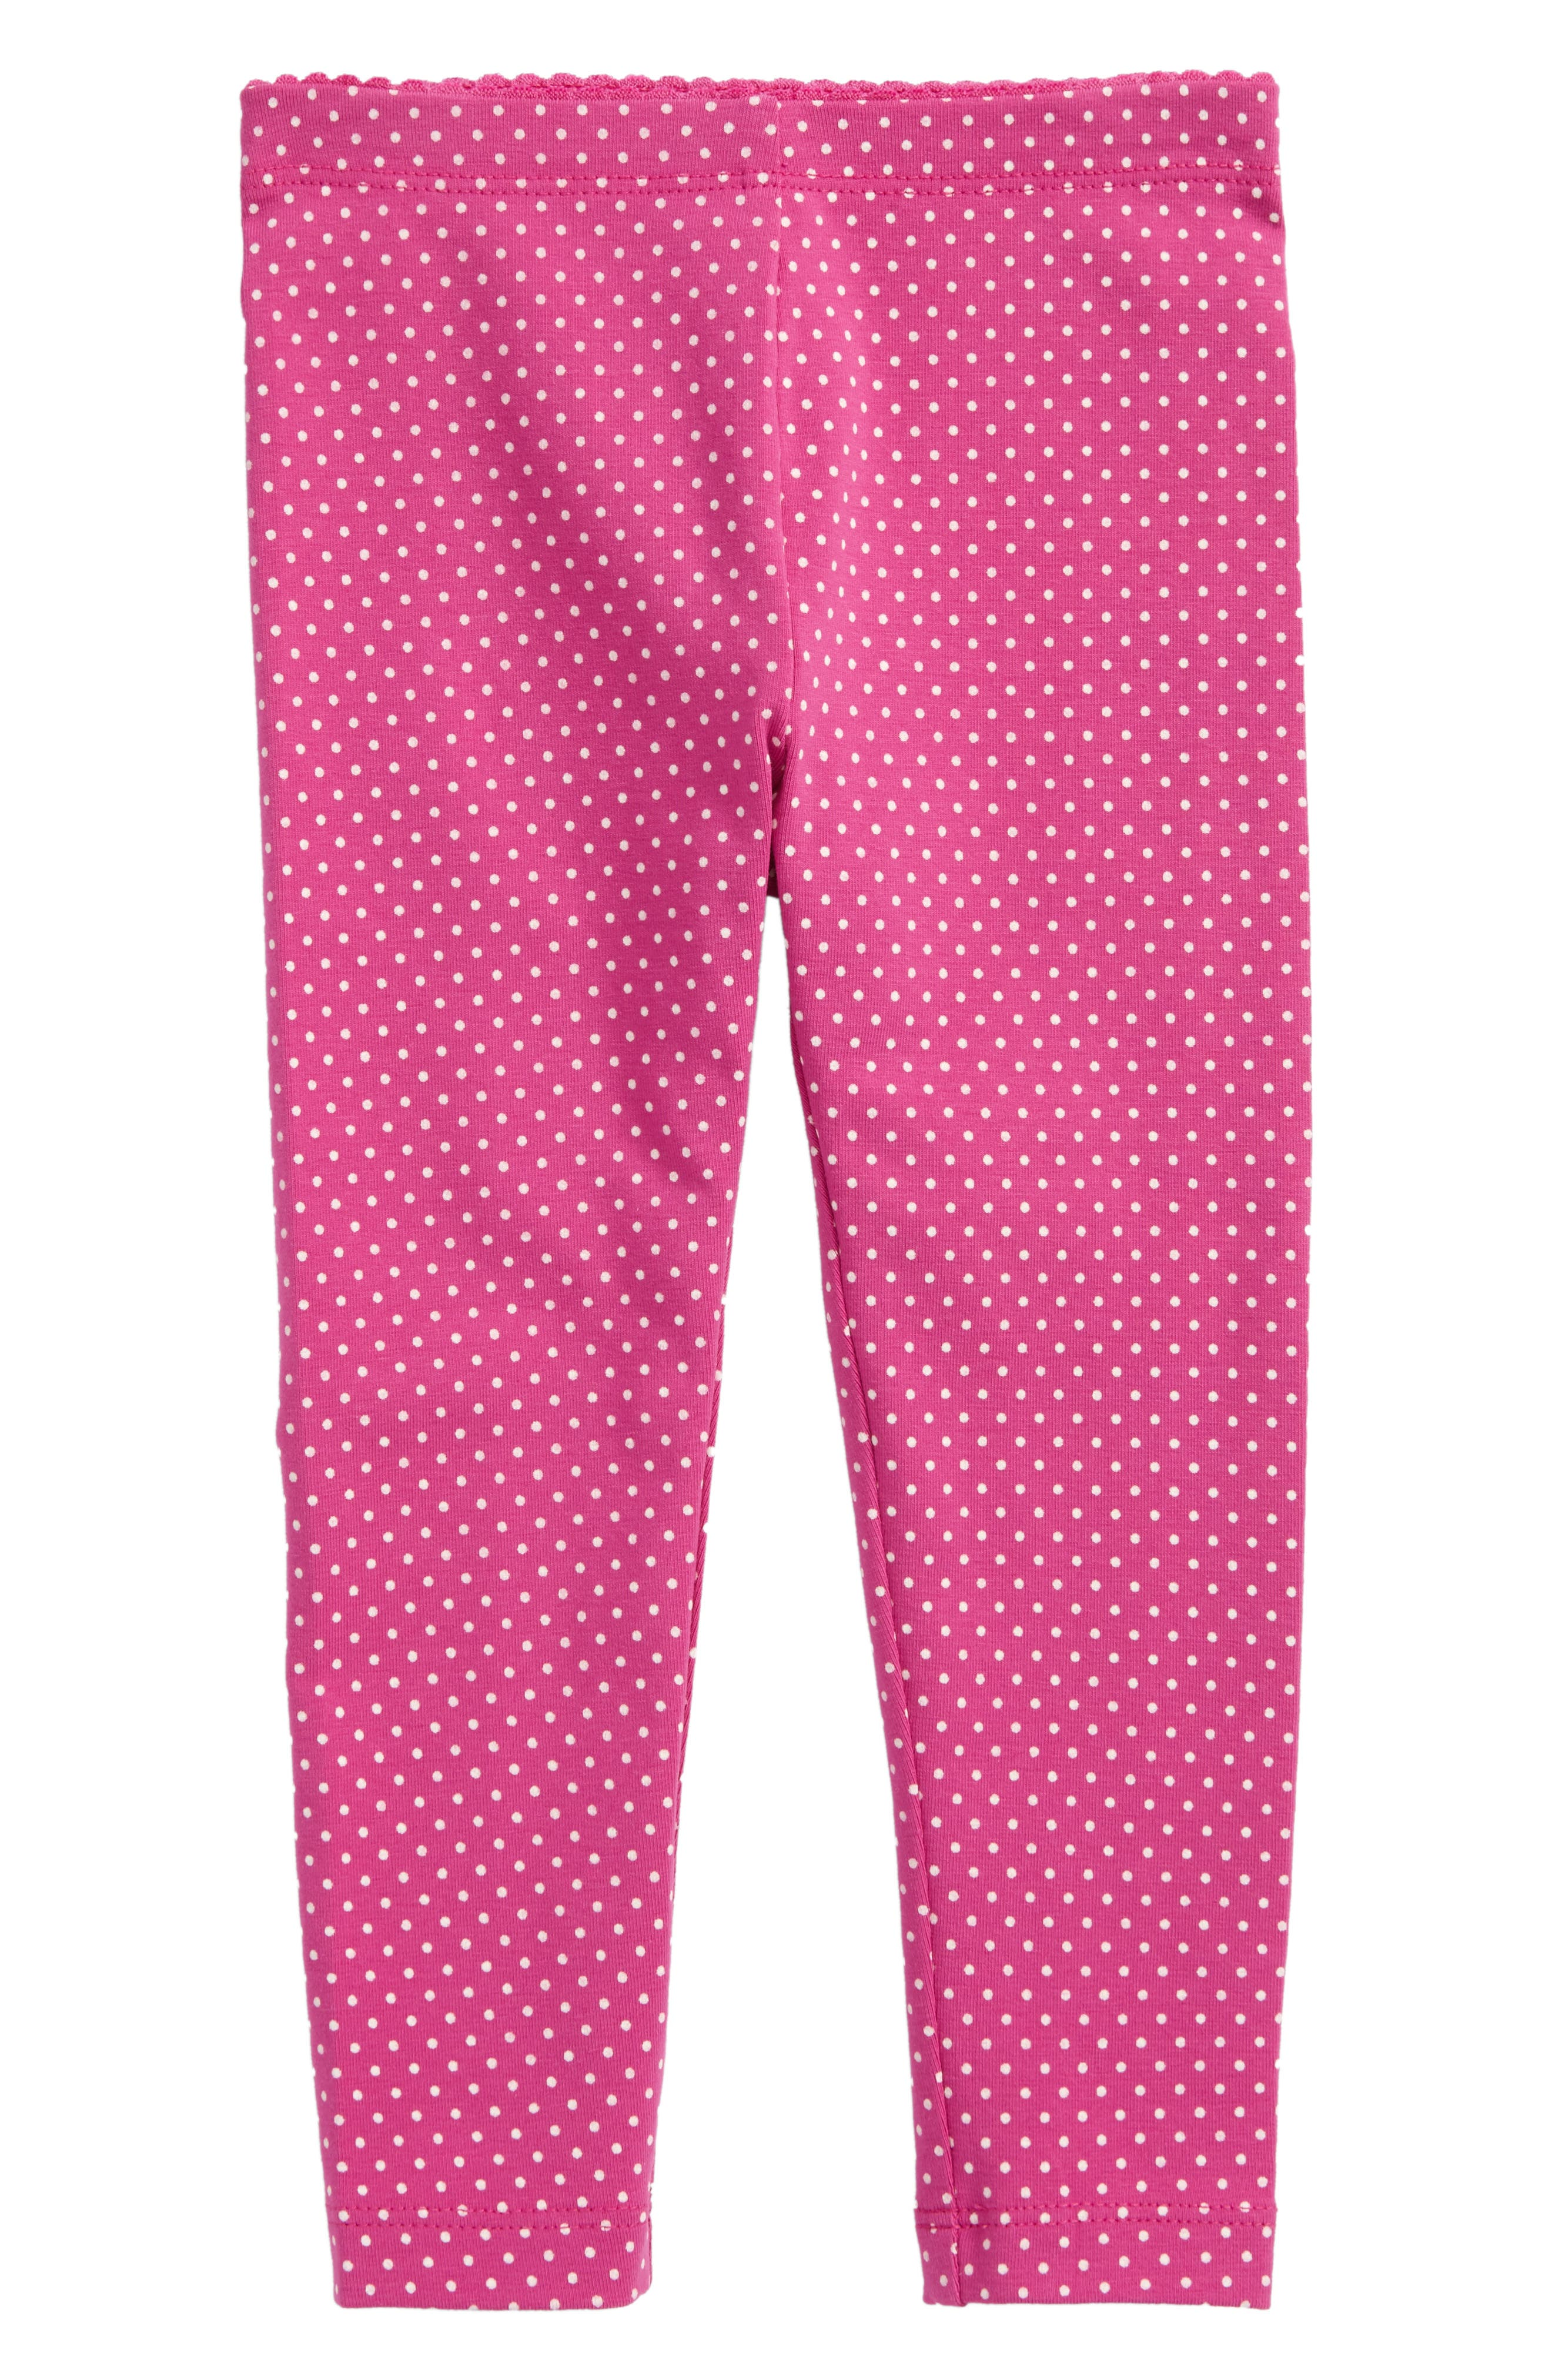 Alternate Image 1 Selected - Tea Collection Pin Dot Leggings (Baby Girls)